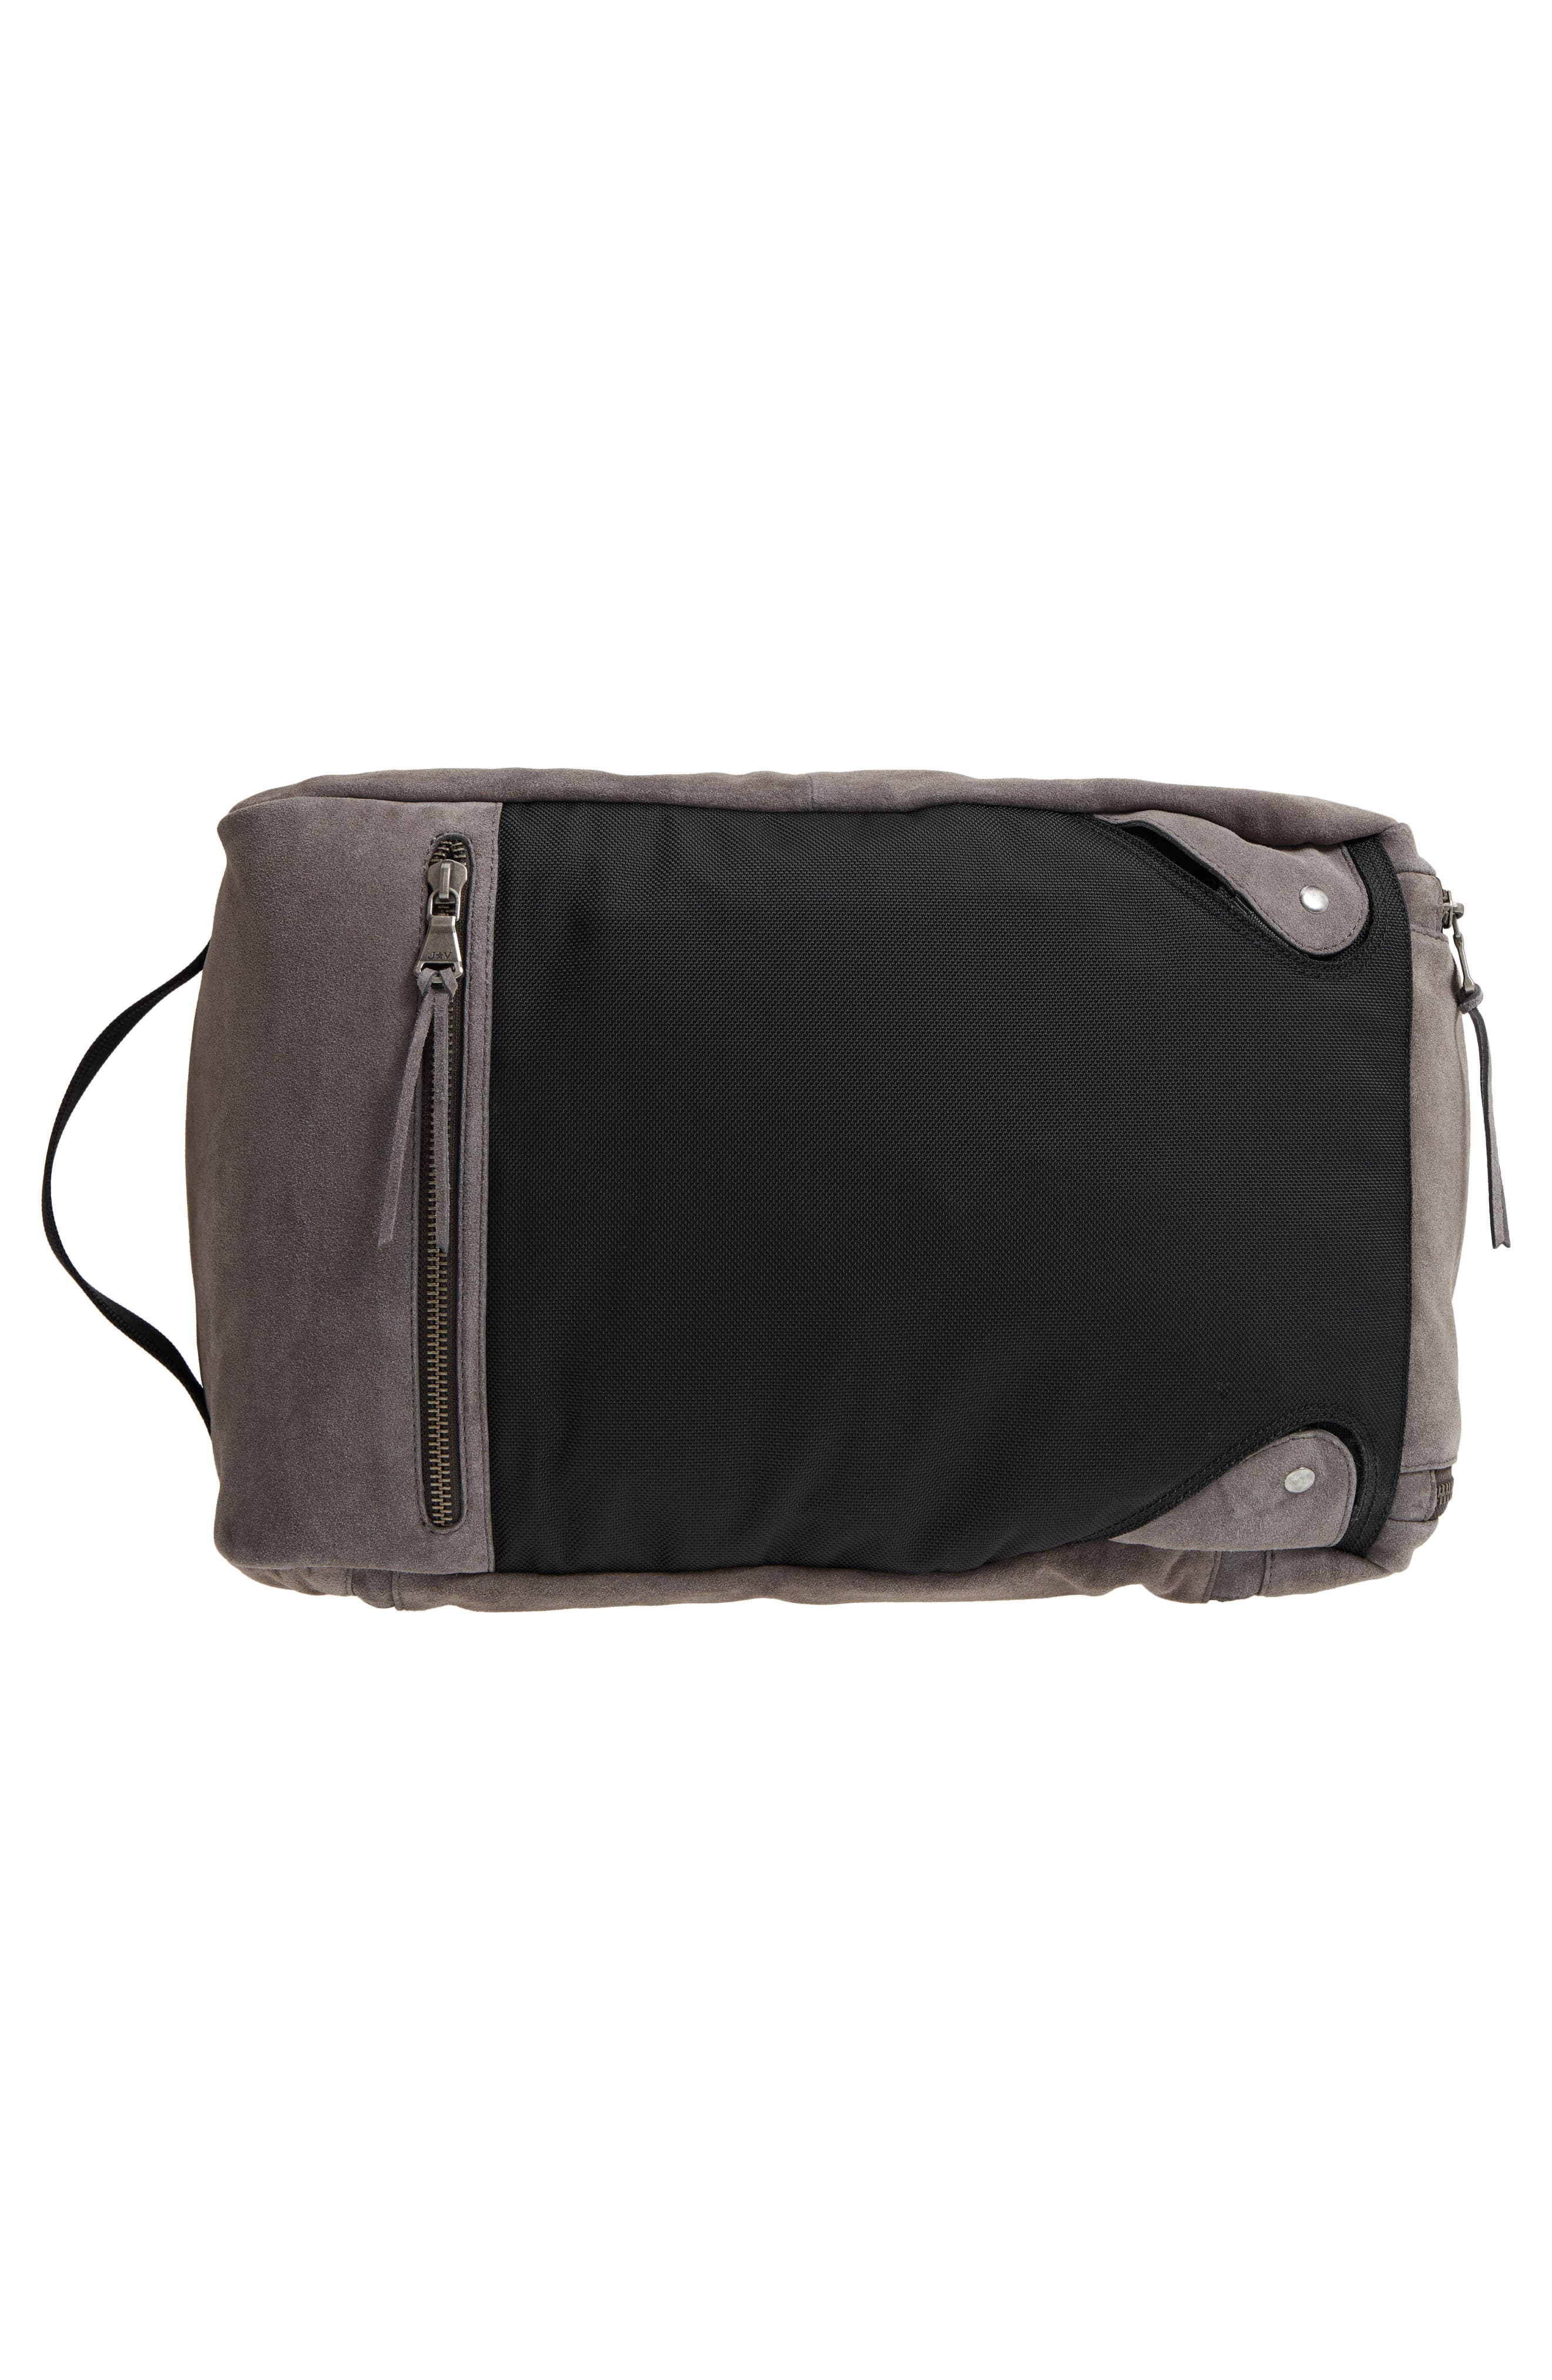 Brooklyn Suede Convertible Duffel Bag,                             Alternate thumbnail 7, color,                             Lead